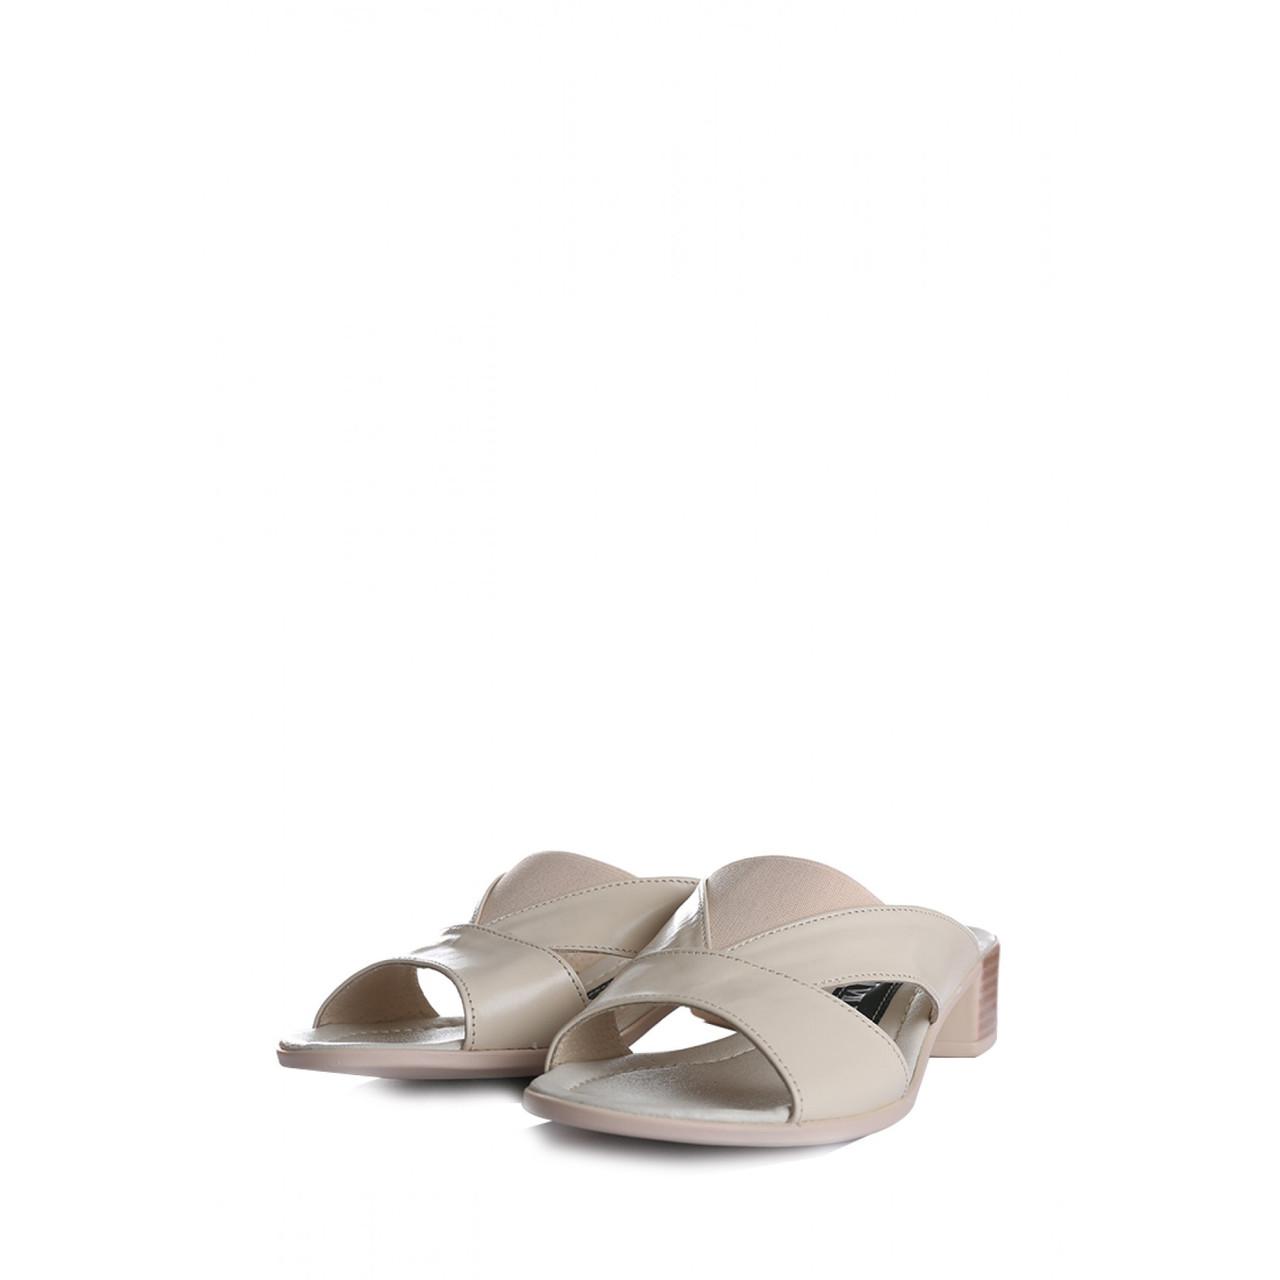 Женские шлепанцы из кожи на маленьком каблуке